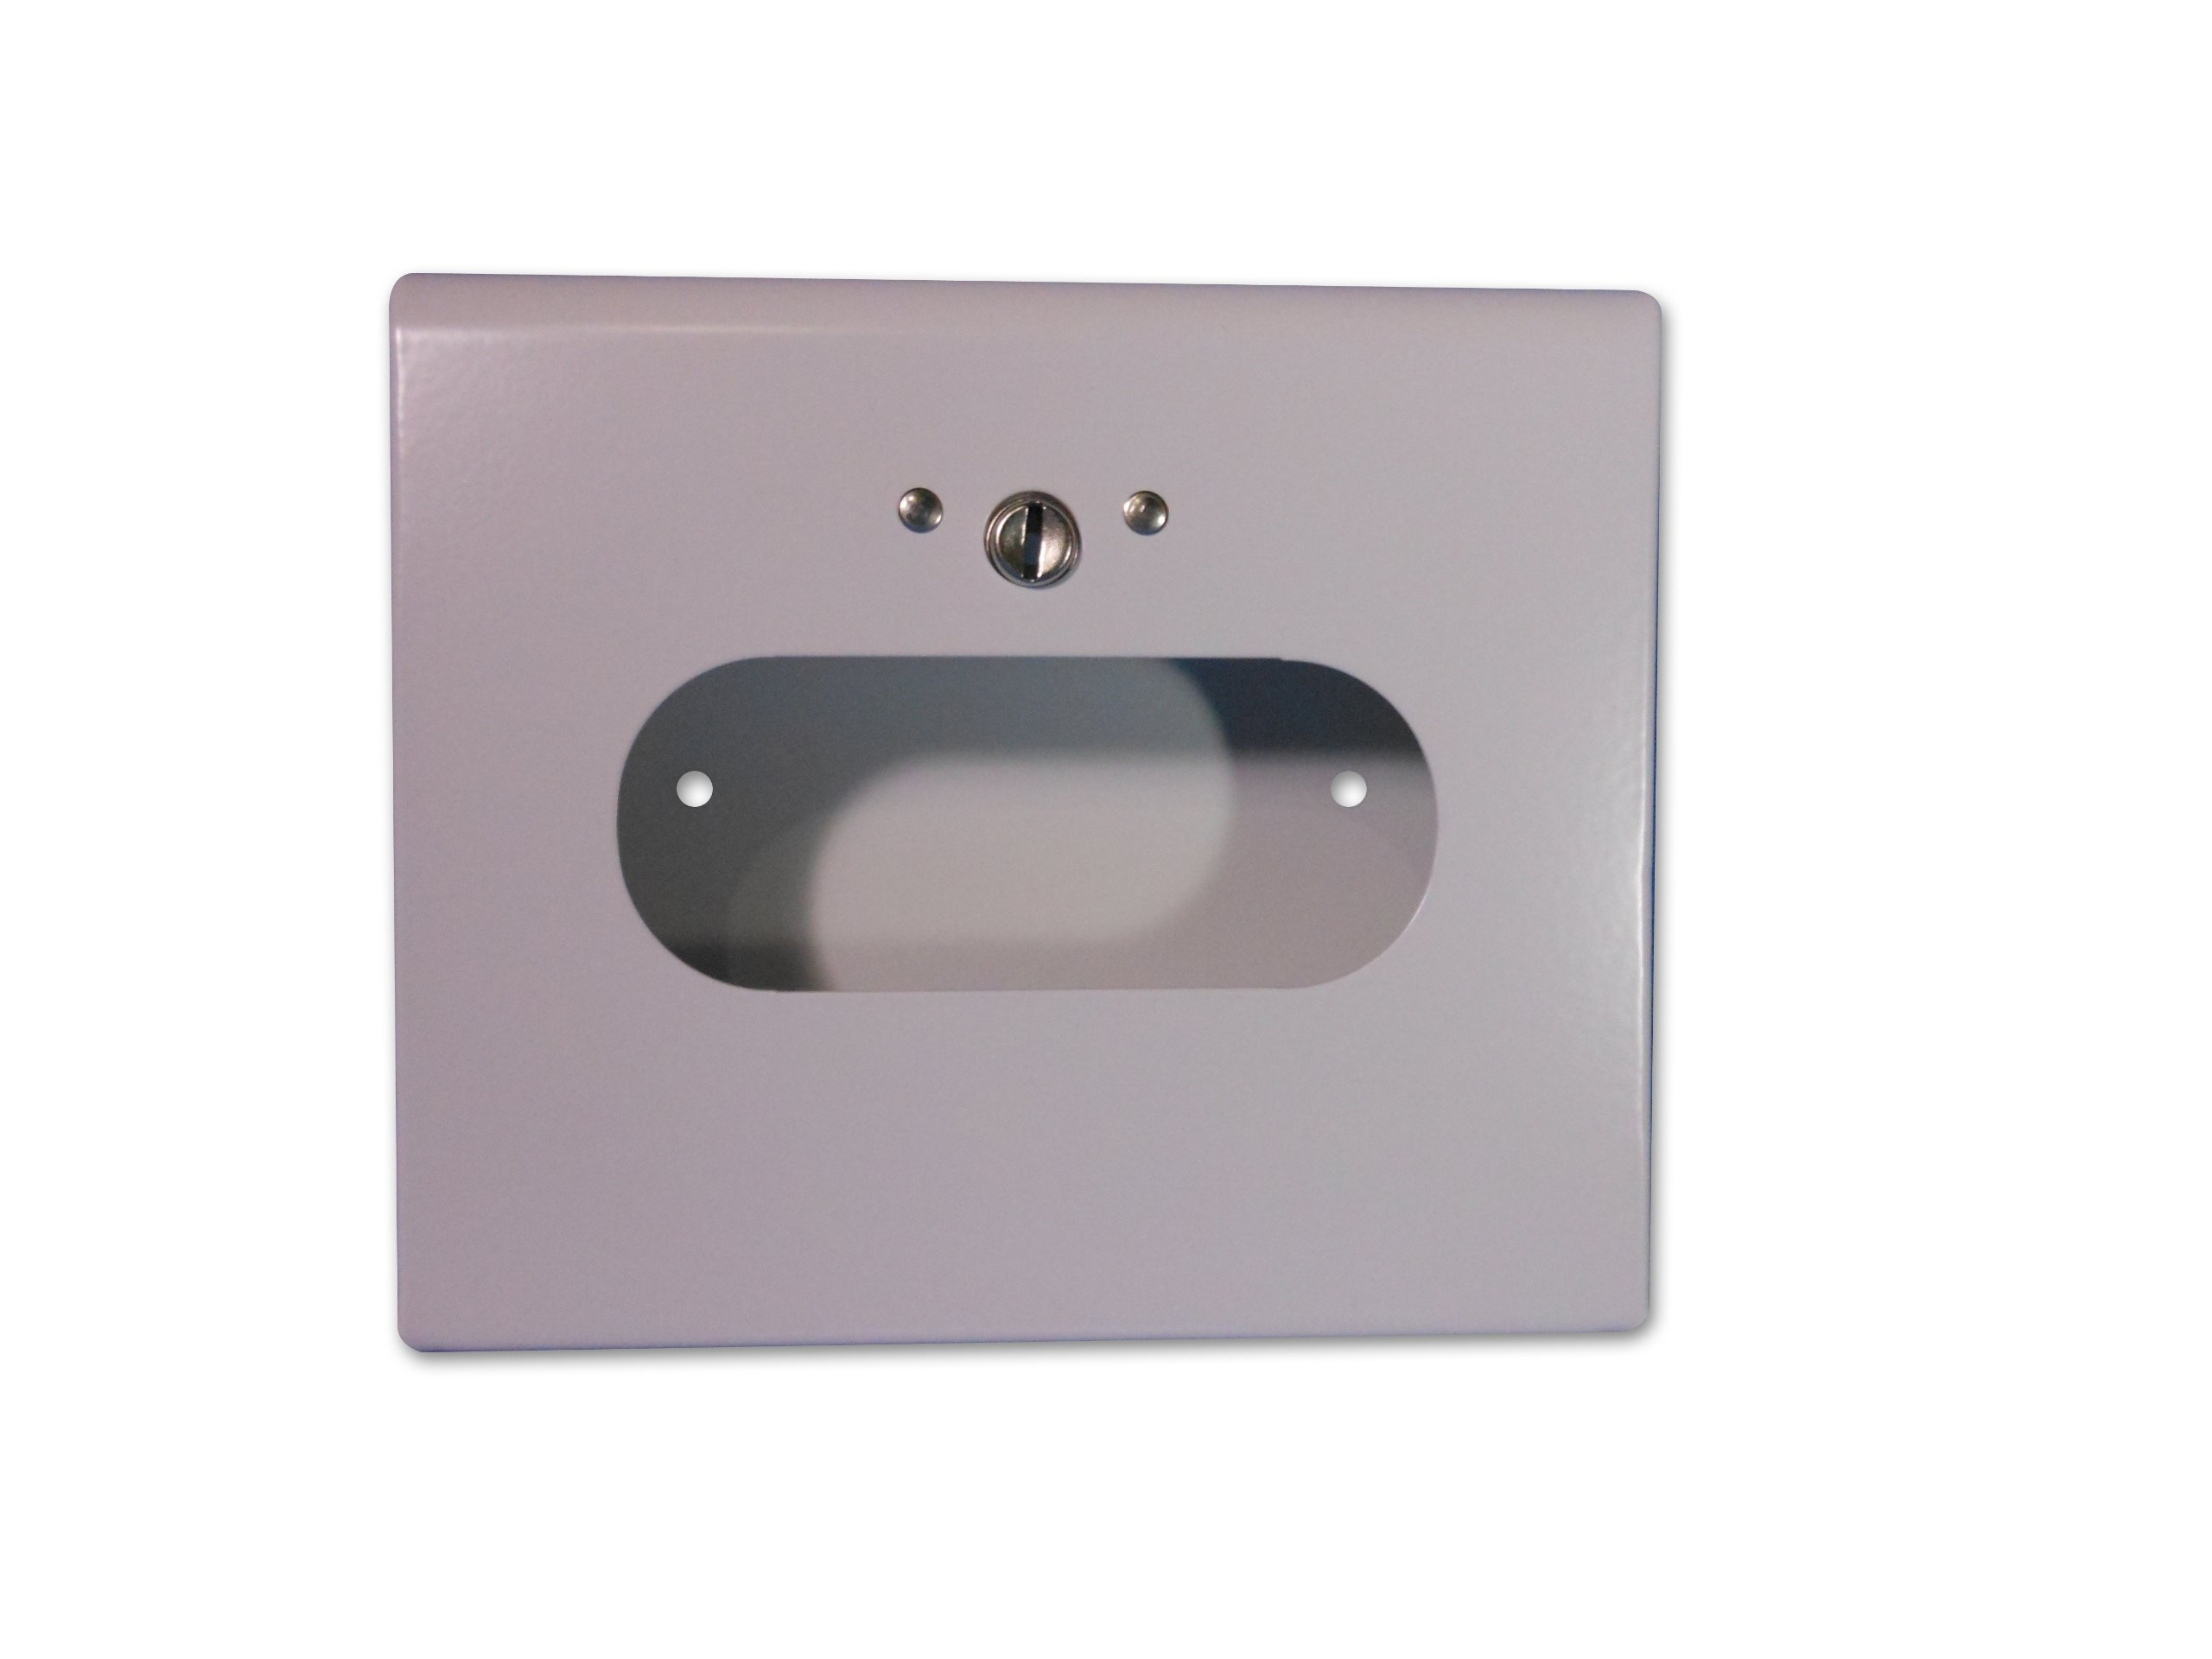 S.A.C SD2012B 22 Gauge Steel Sanitary Napkin Disposal Bag Box Dispenser with Lock, 6-1/4'' Length x 5-1/2'' Width x 1-1/2'' Height, White